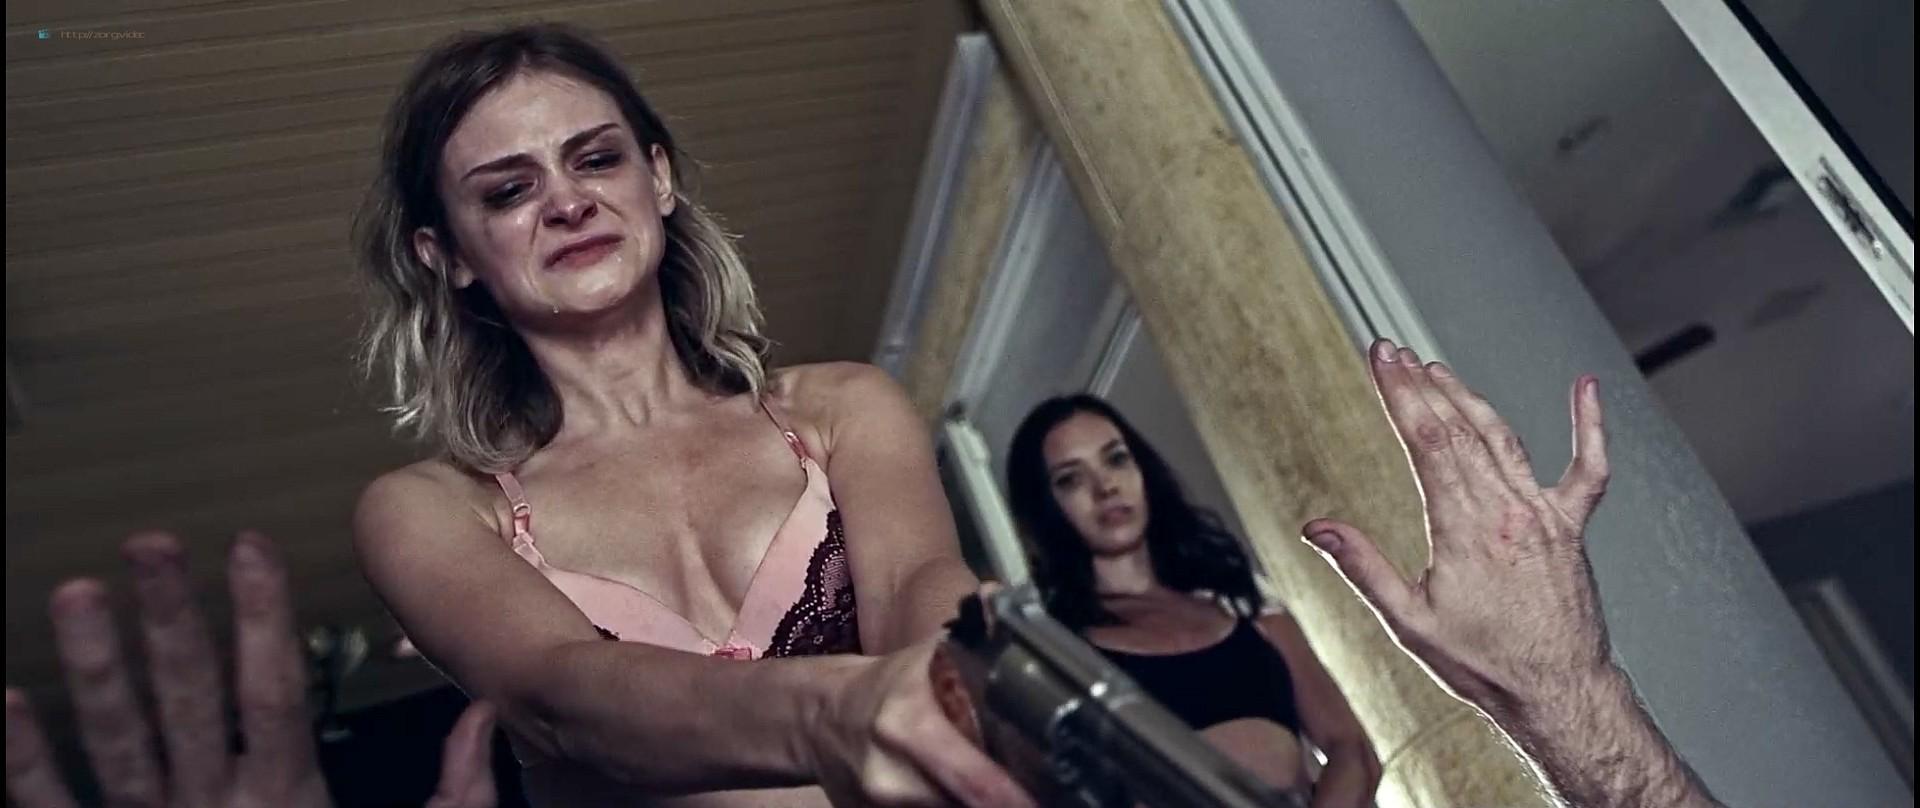 Jemma Dallender nude Rachel Rosenstein nude butt - The Executioners (2018) HD 1080p (2)